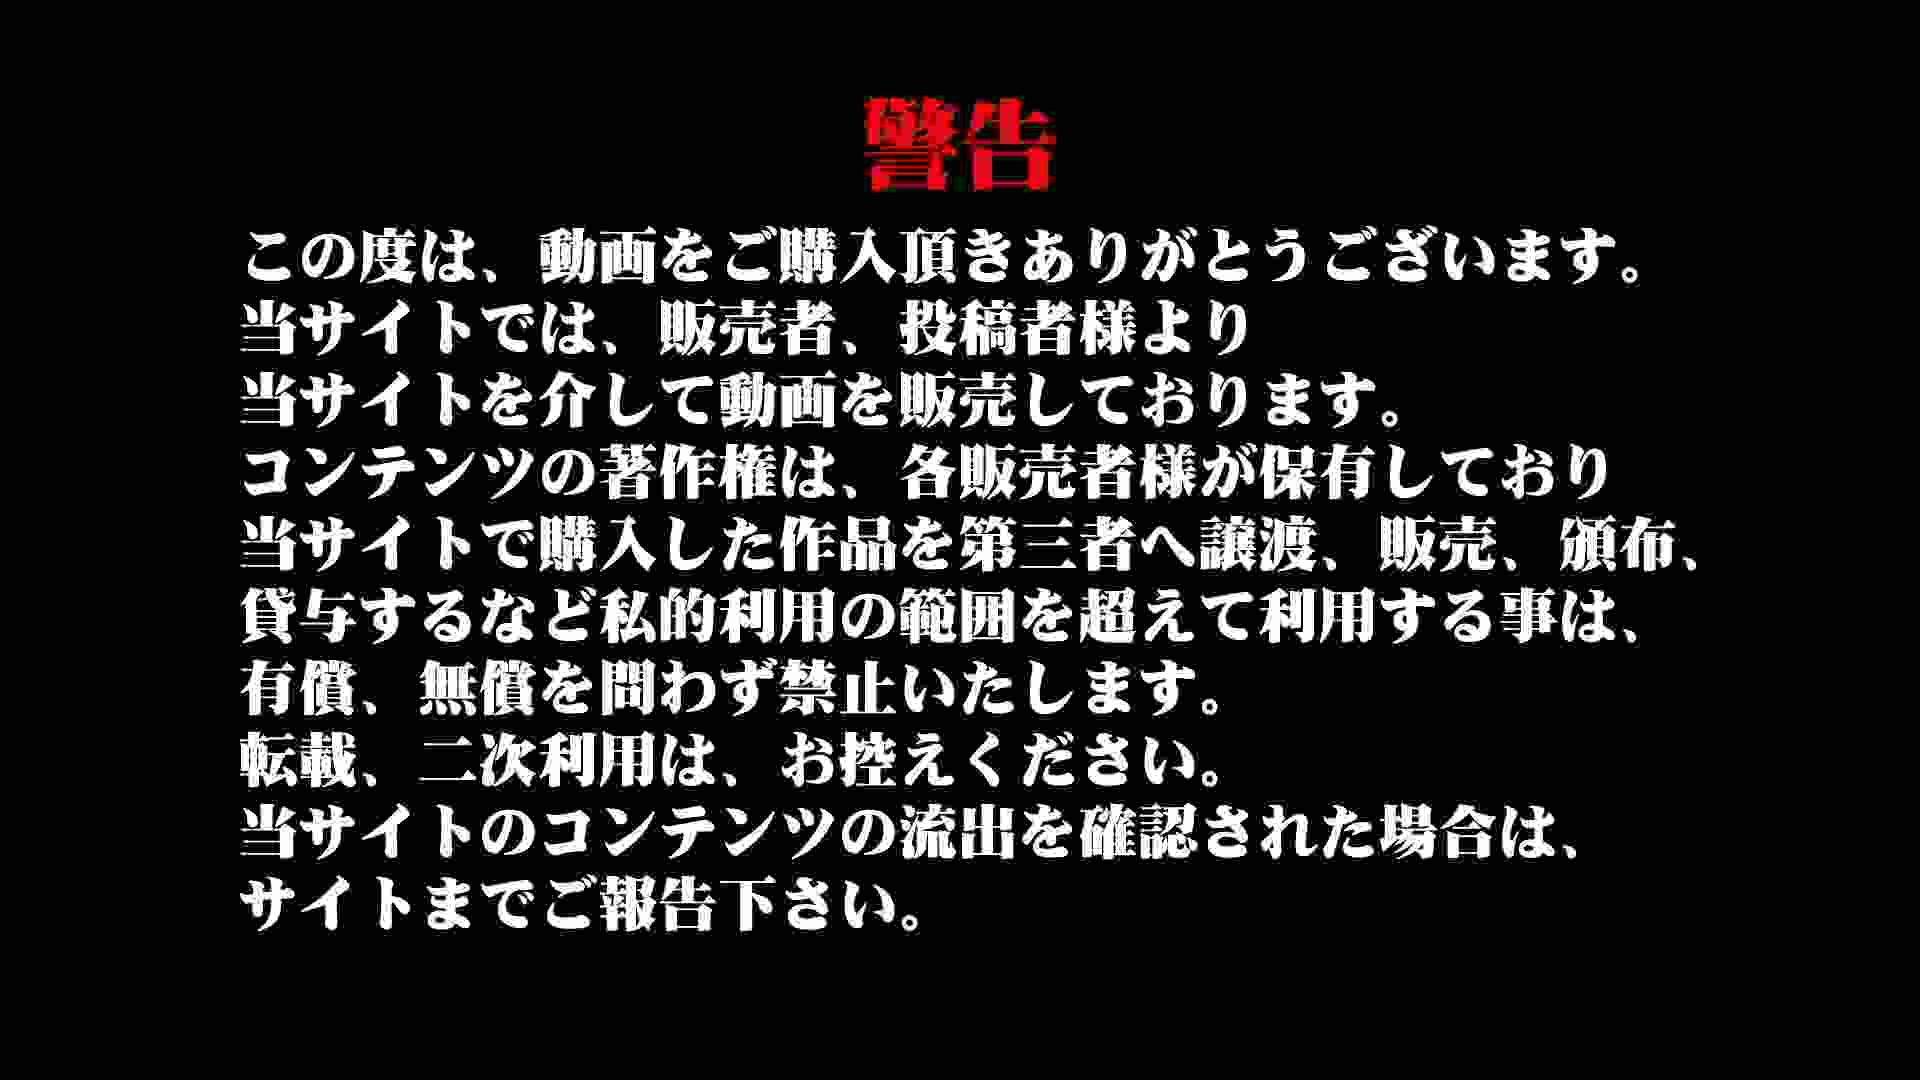 Aquaな露天風呂Vol.892 露天風呂突入 ヌード画像 72pic 2